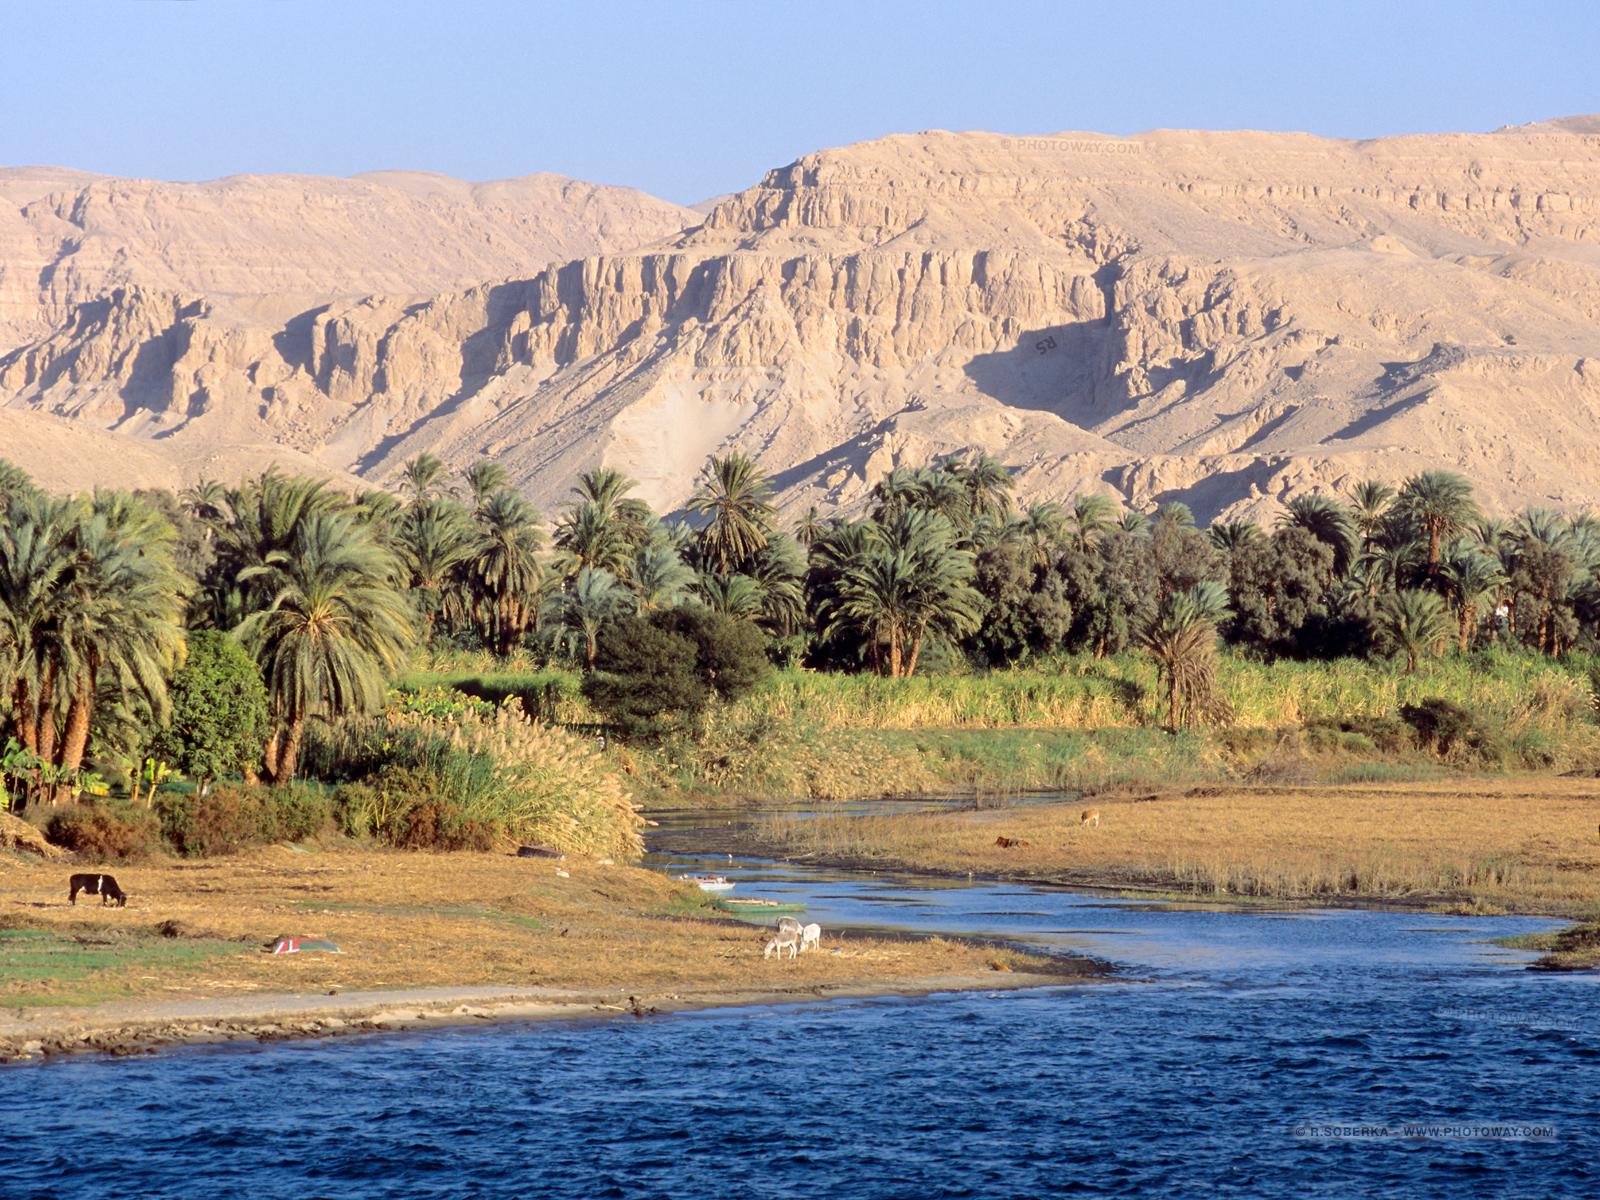 Egipat EG02_162-nil-rive-1600x1200